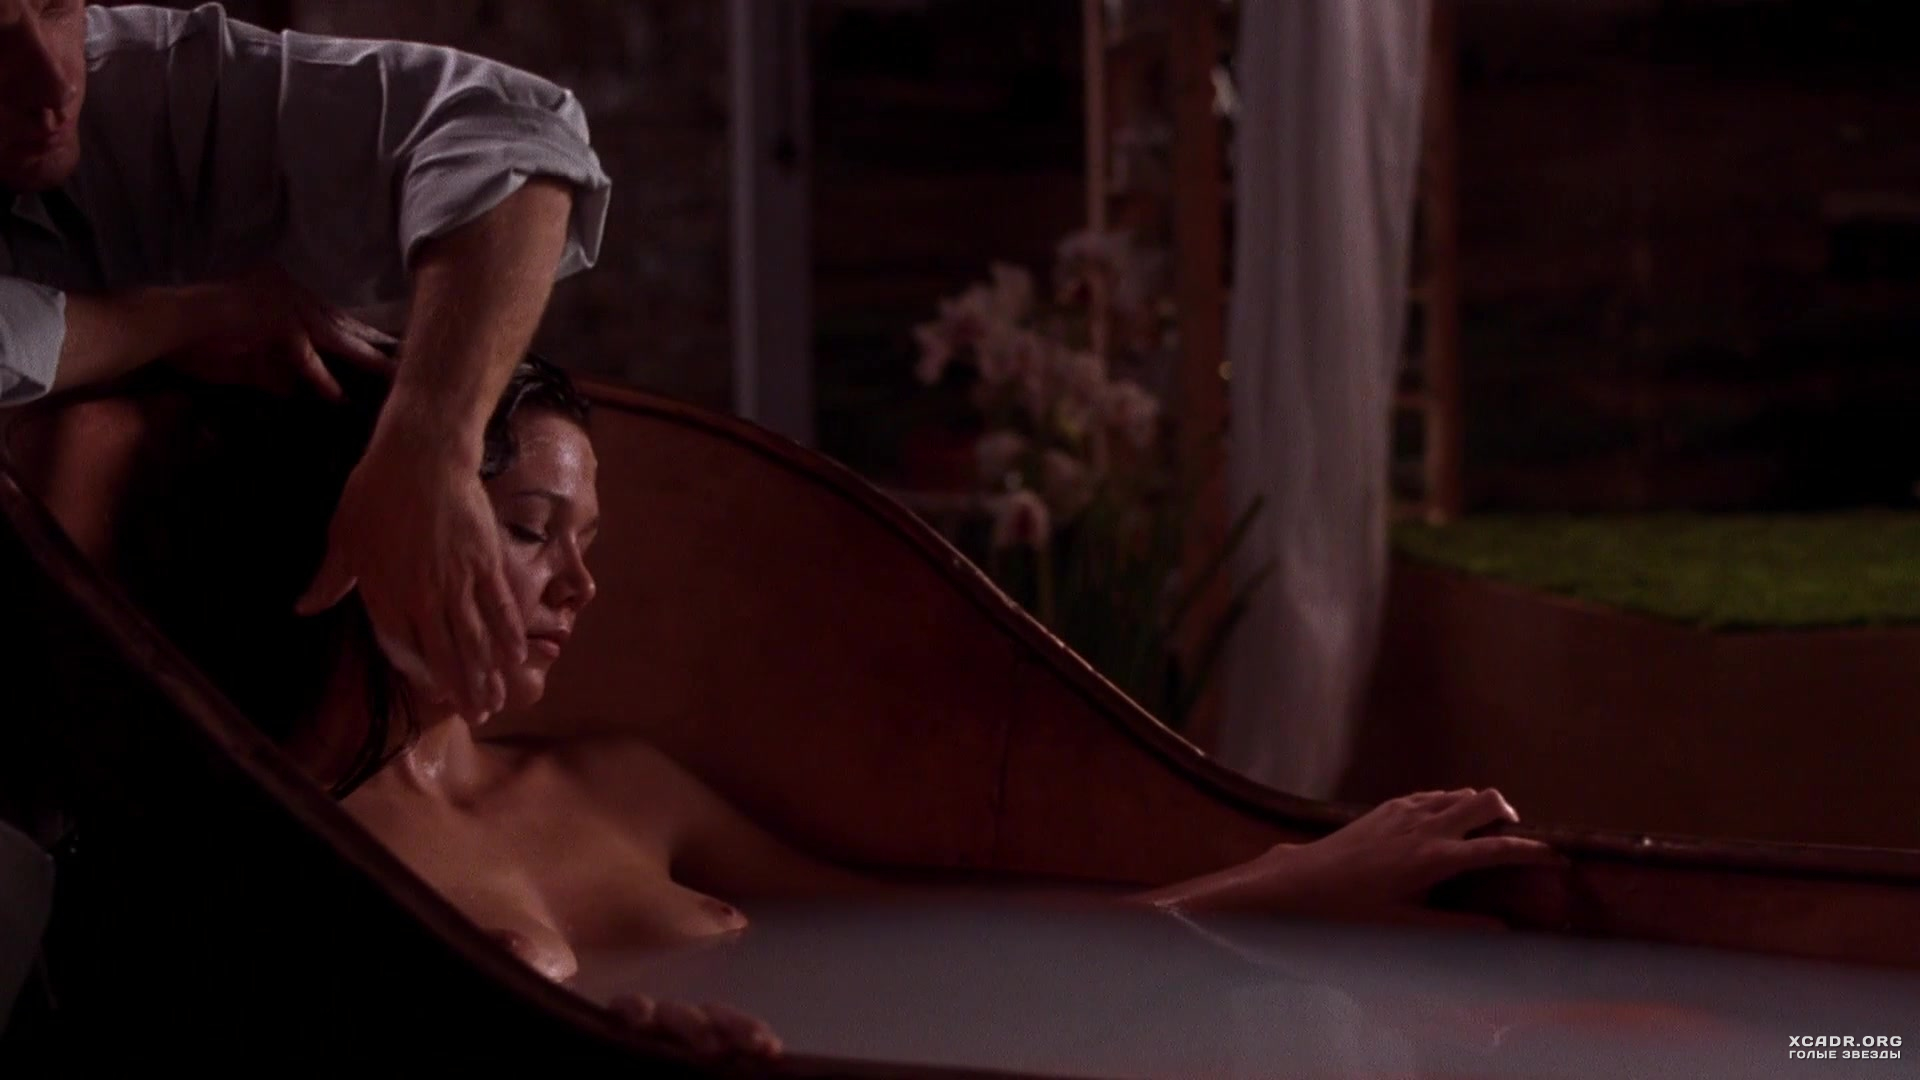 stseni-seksa-s-sekretarshami-v-kino